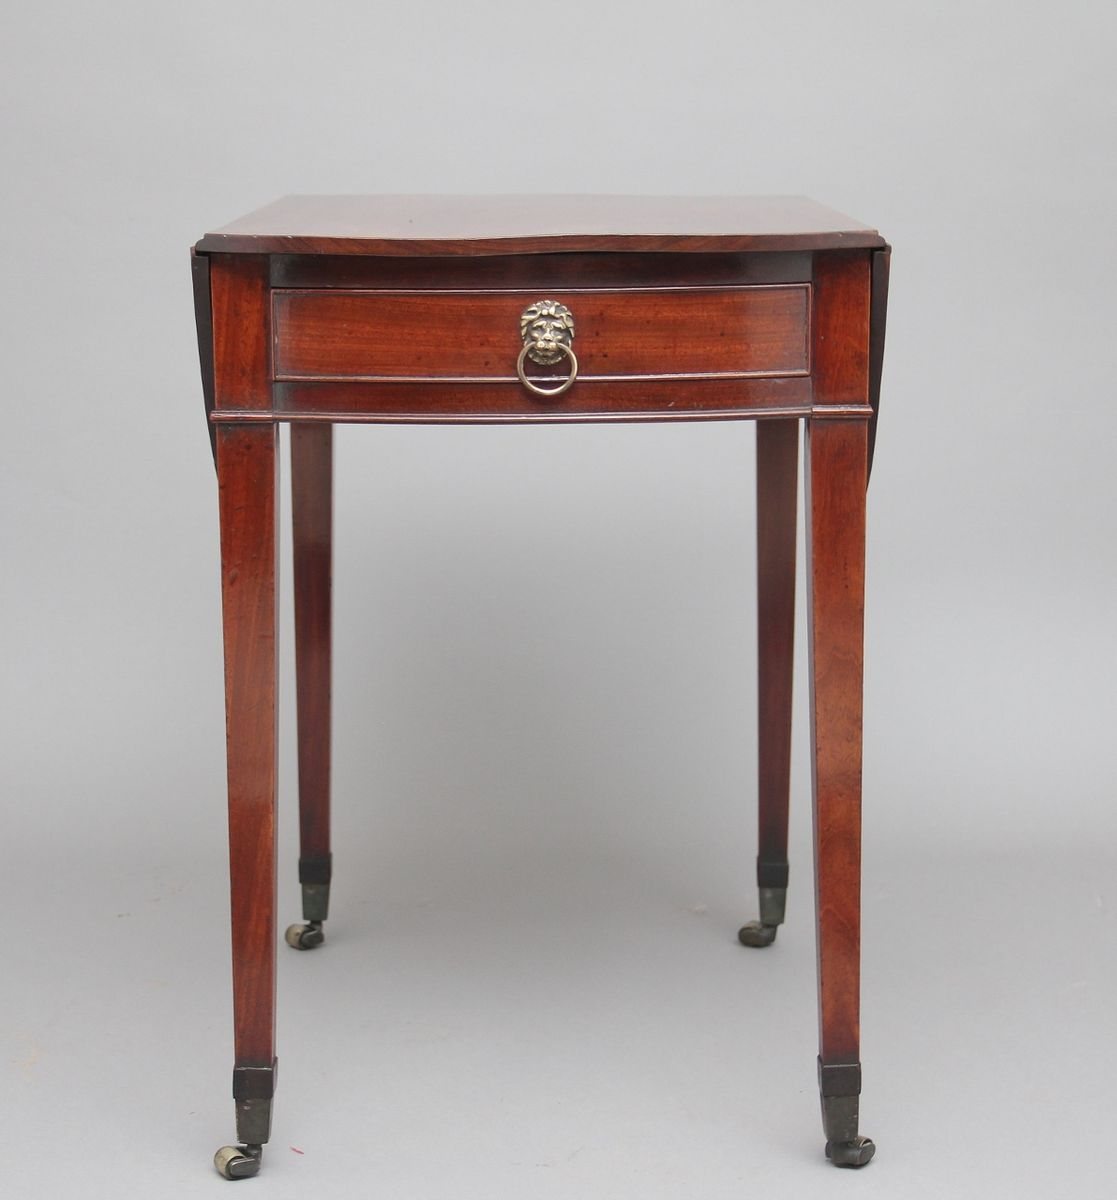 Pembroke Tisch aus Mahagoni, 1790er